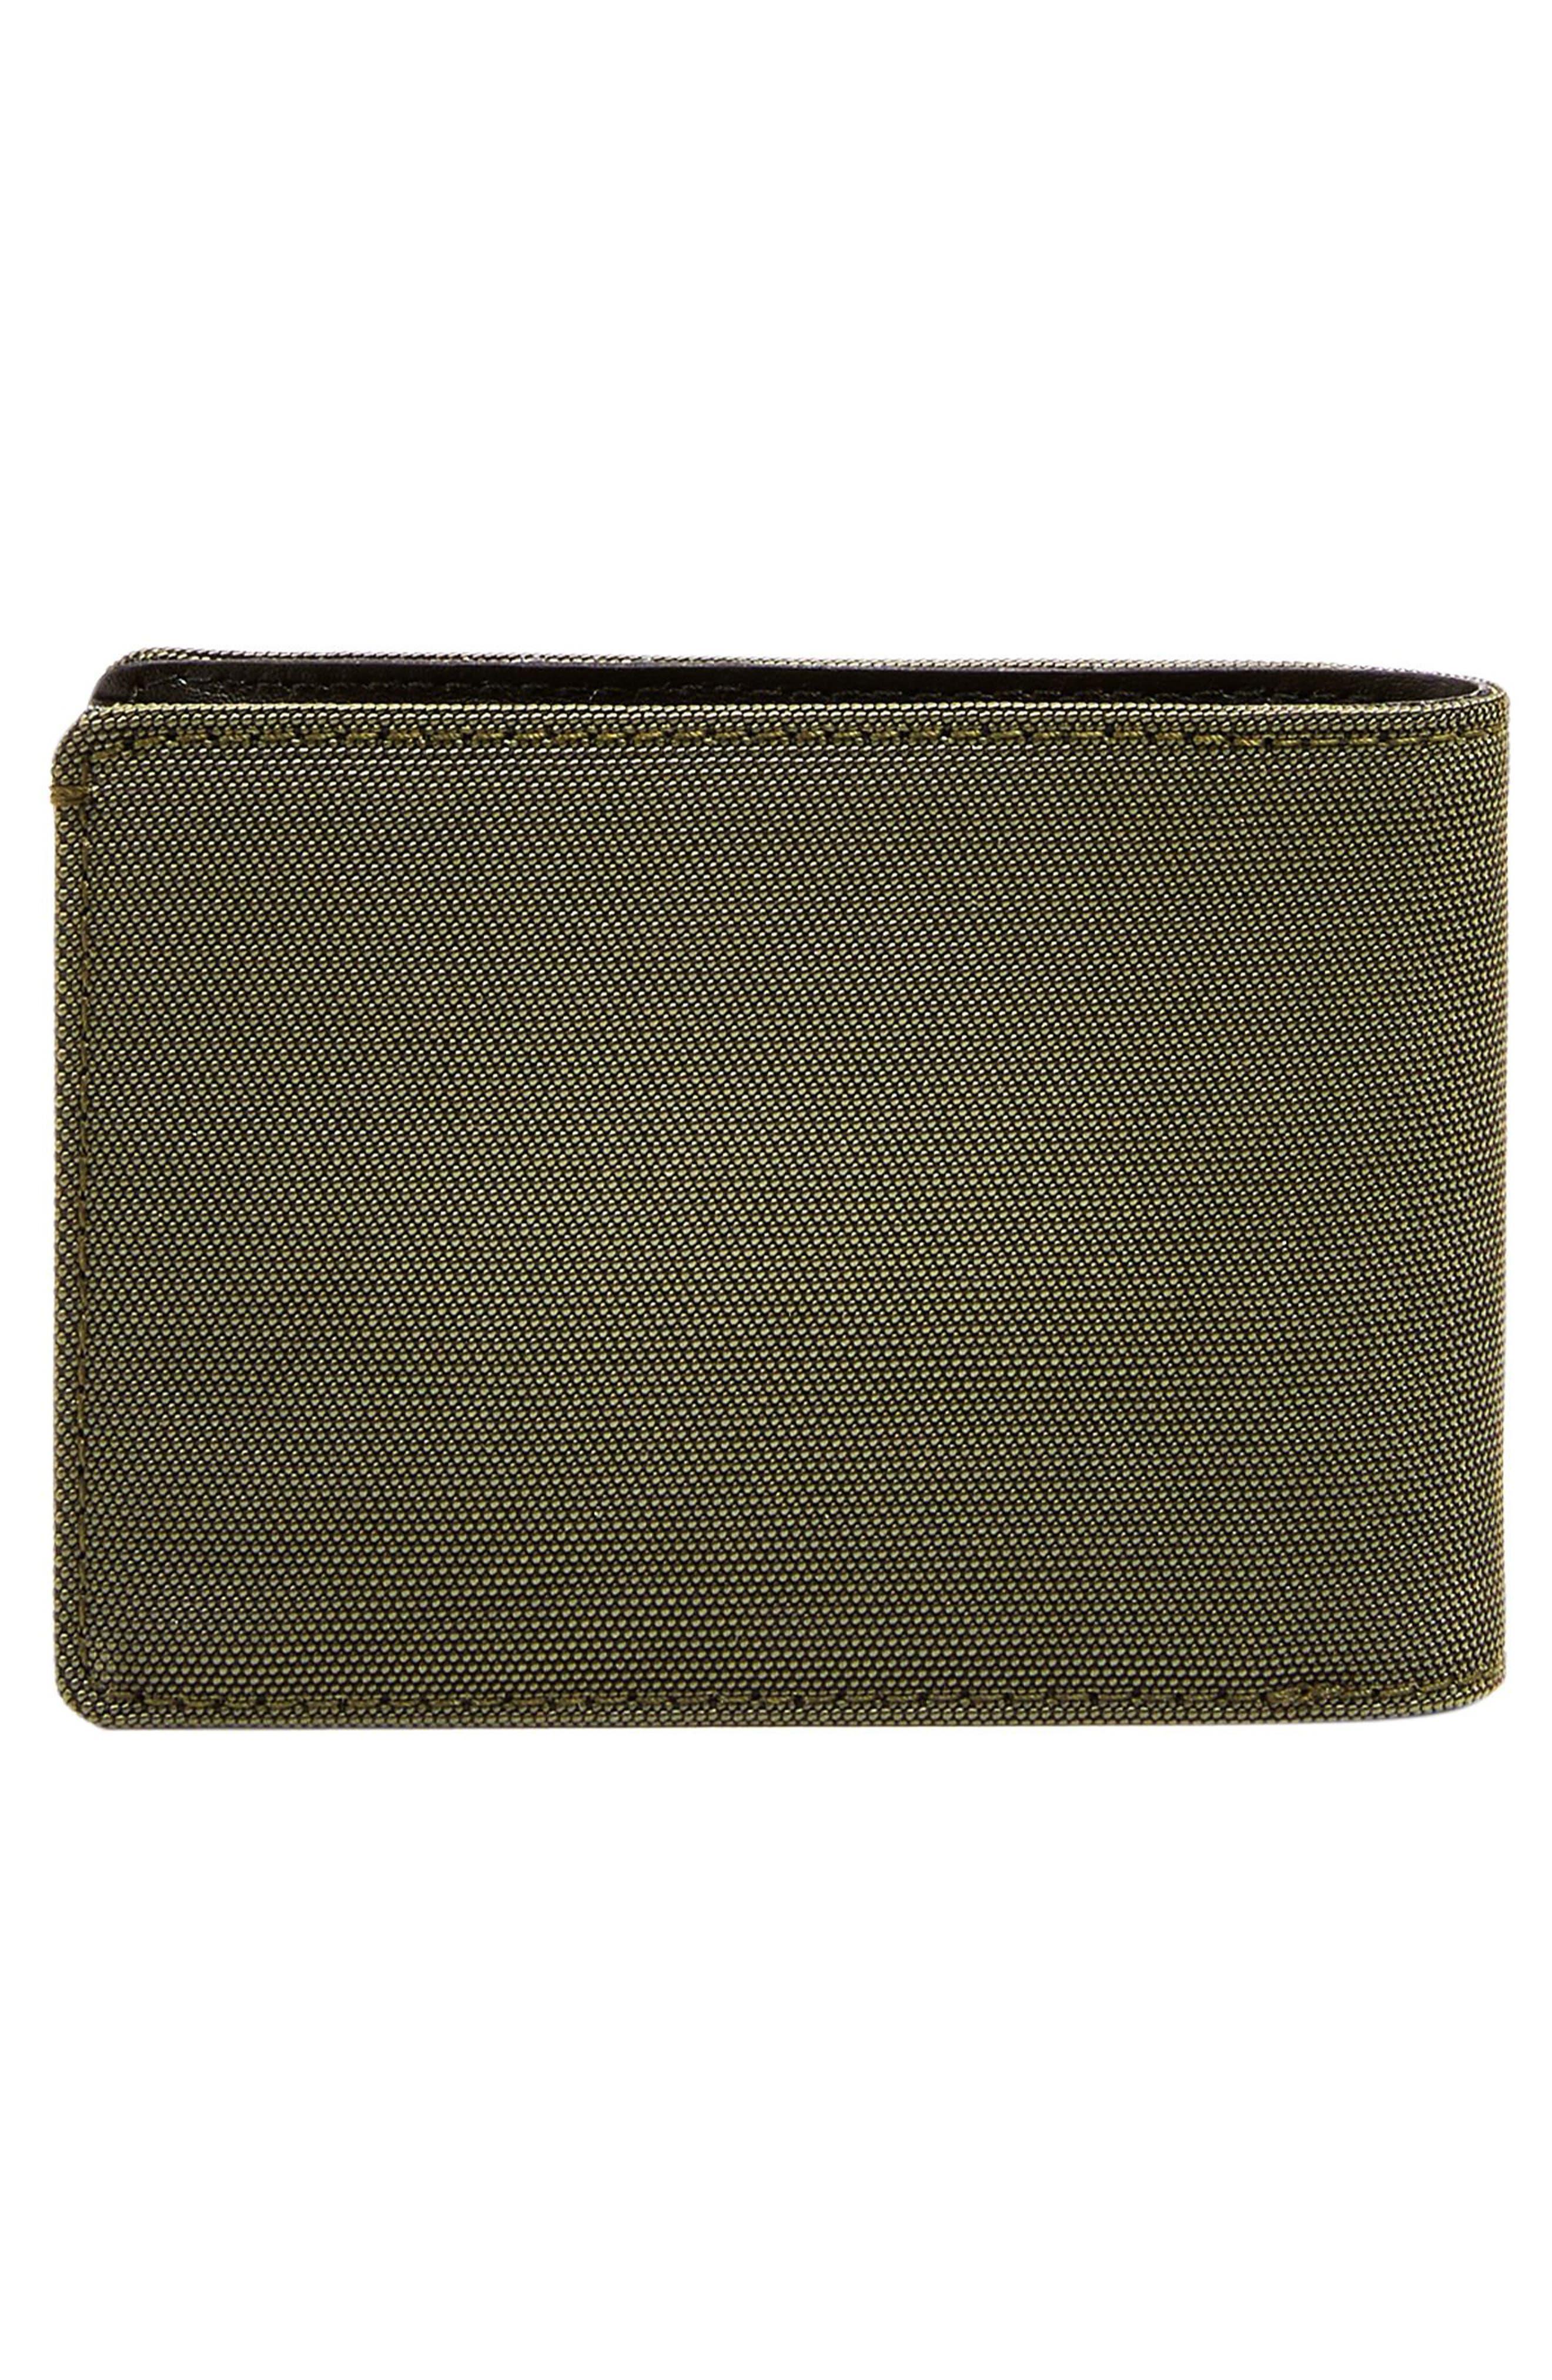 Bifold Wallet,                             Alternate thumbnail 3, color,                             348